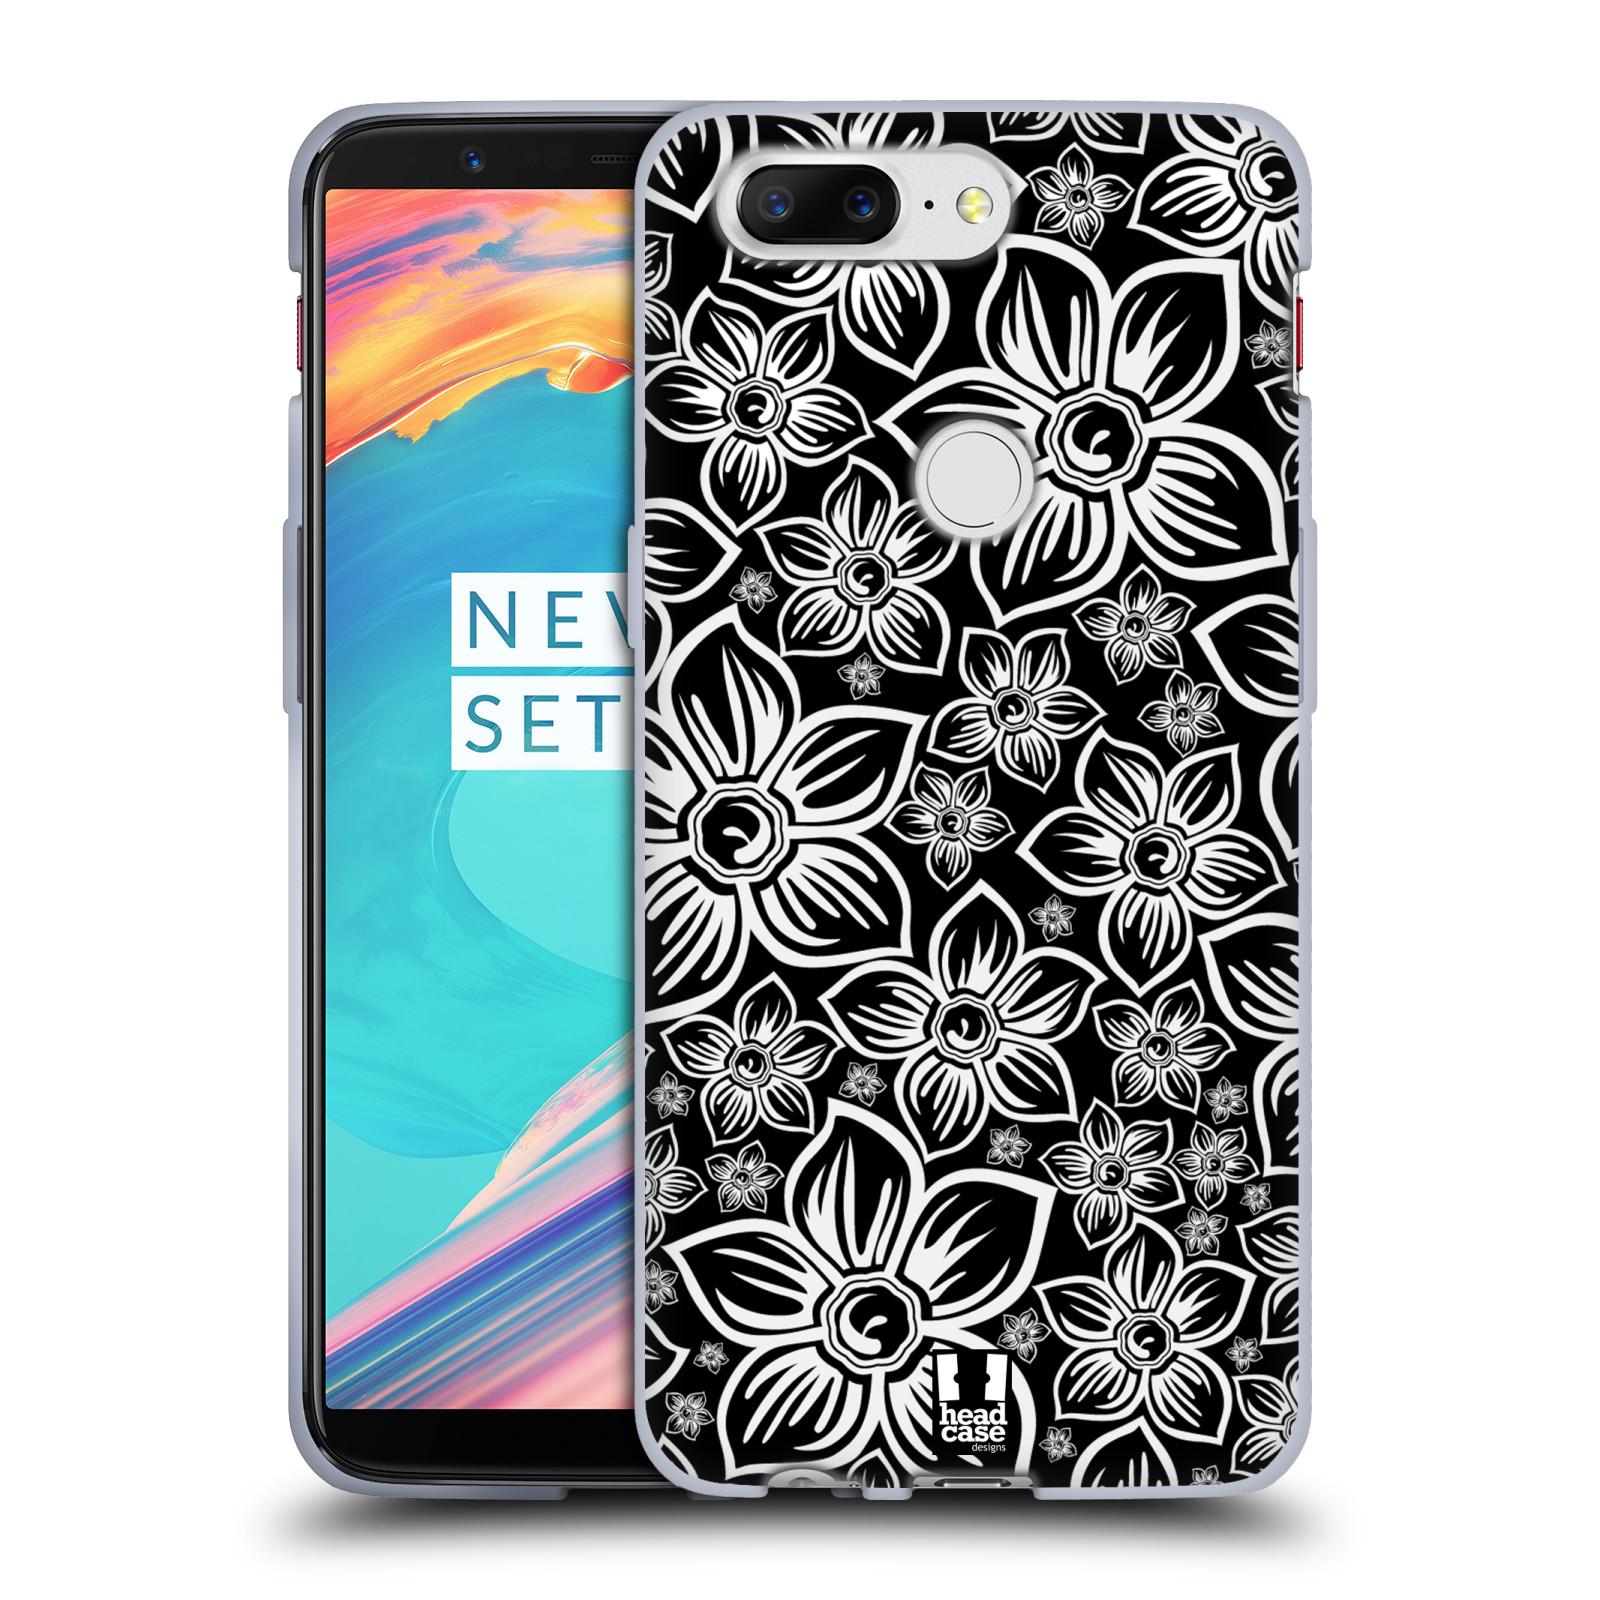 Silikonové pouzdro na mobil OnePlus 5T - Head Case - FLORAL DAISY